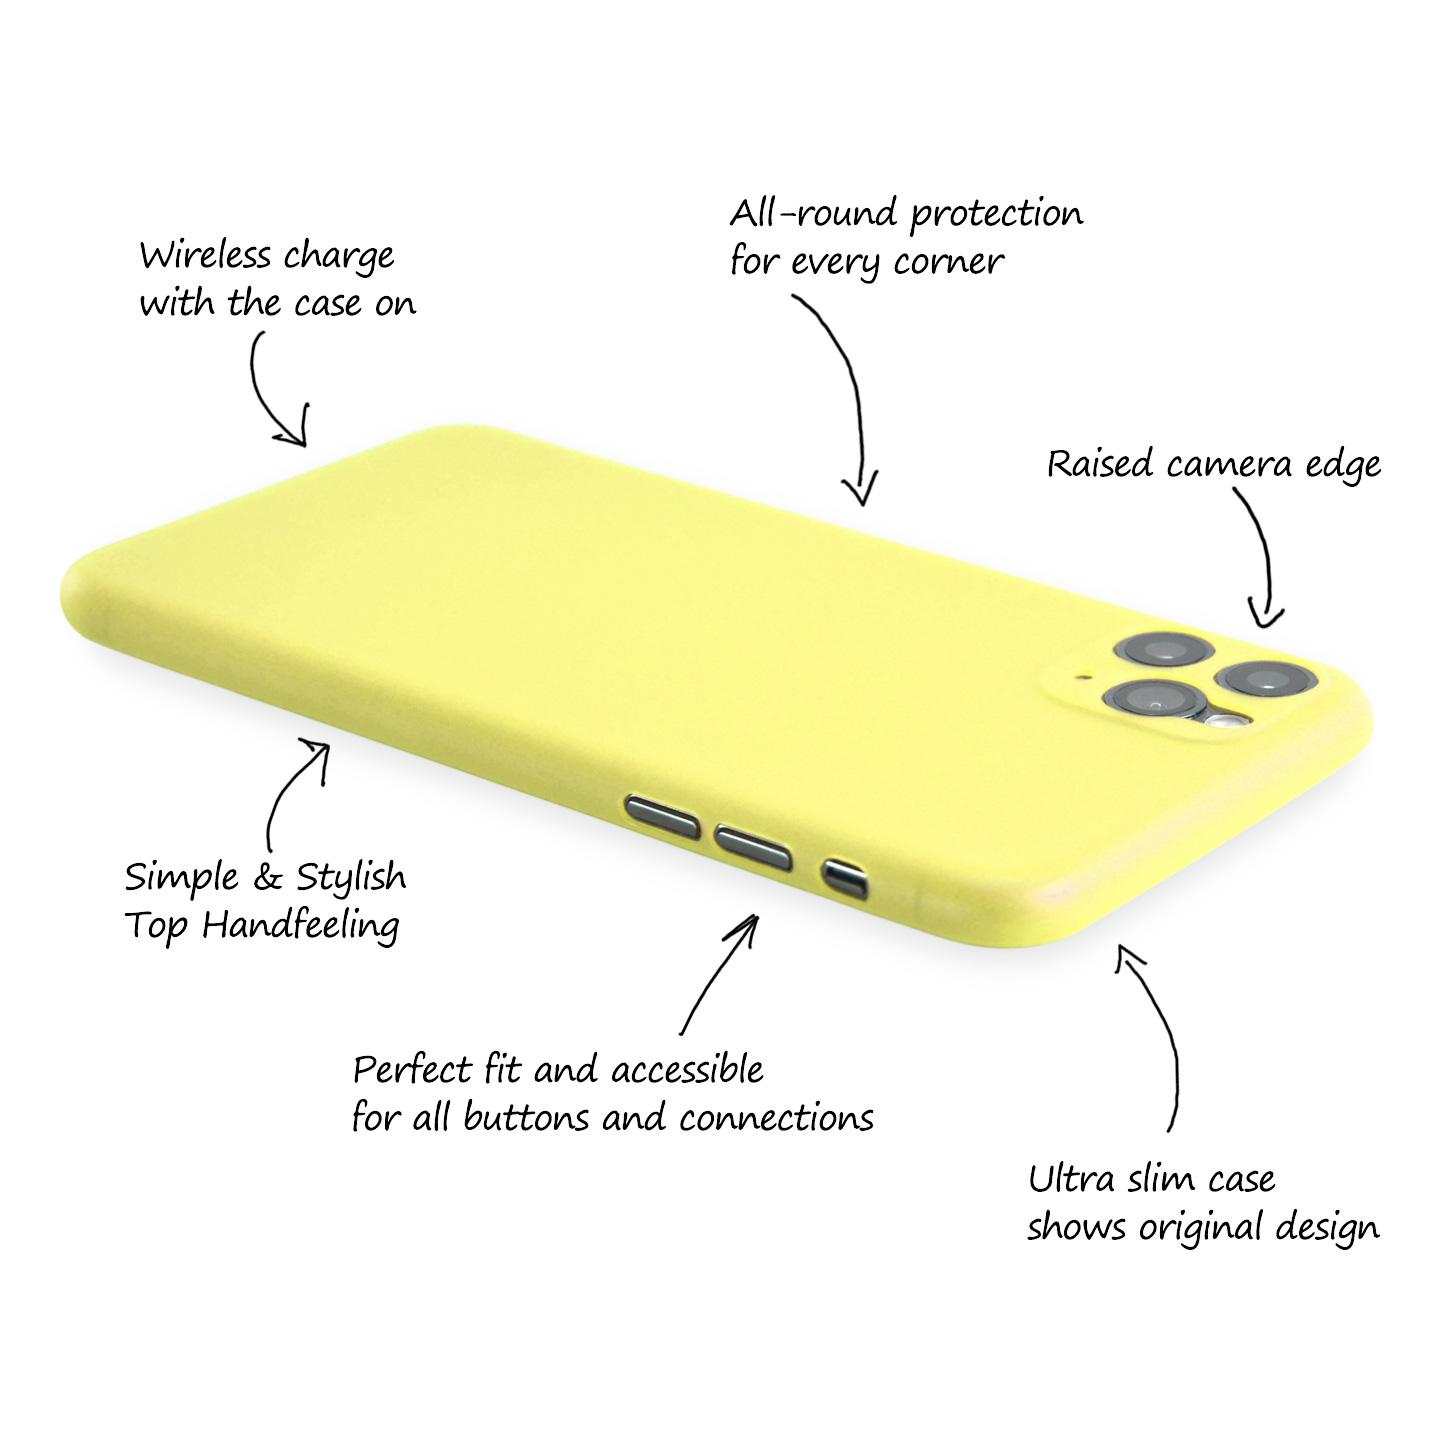 Ultra-Slim-Case-iPhone-11-Pro-5-8-034-Matt-Clear-Schutz-Huelle-Skin-Cover-Etui-Folie Indexbild 34